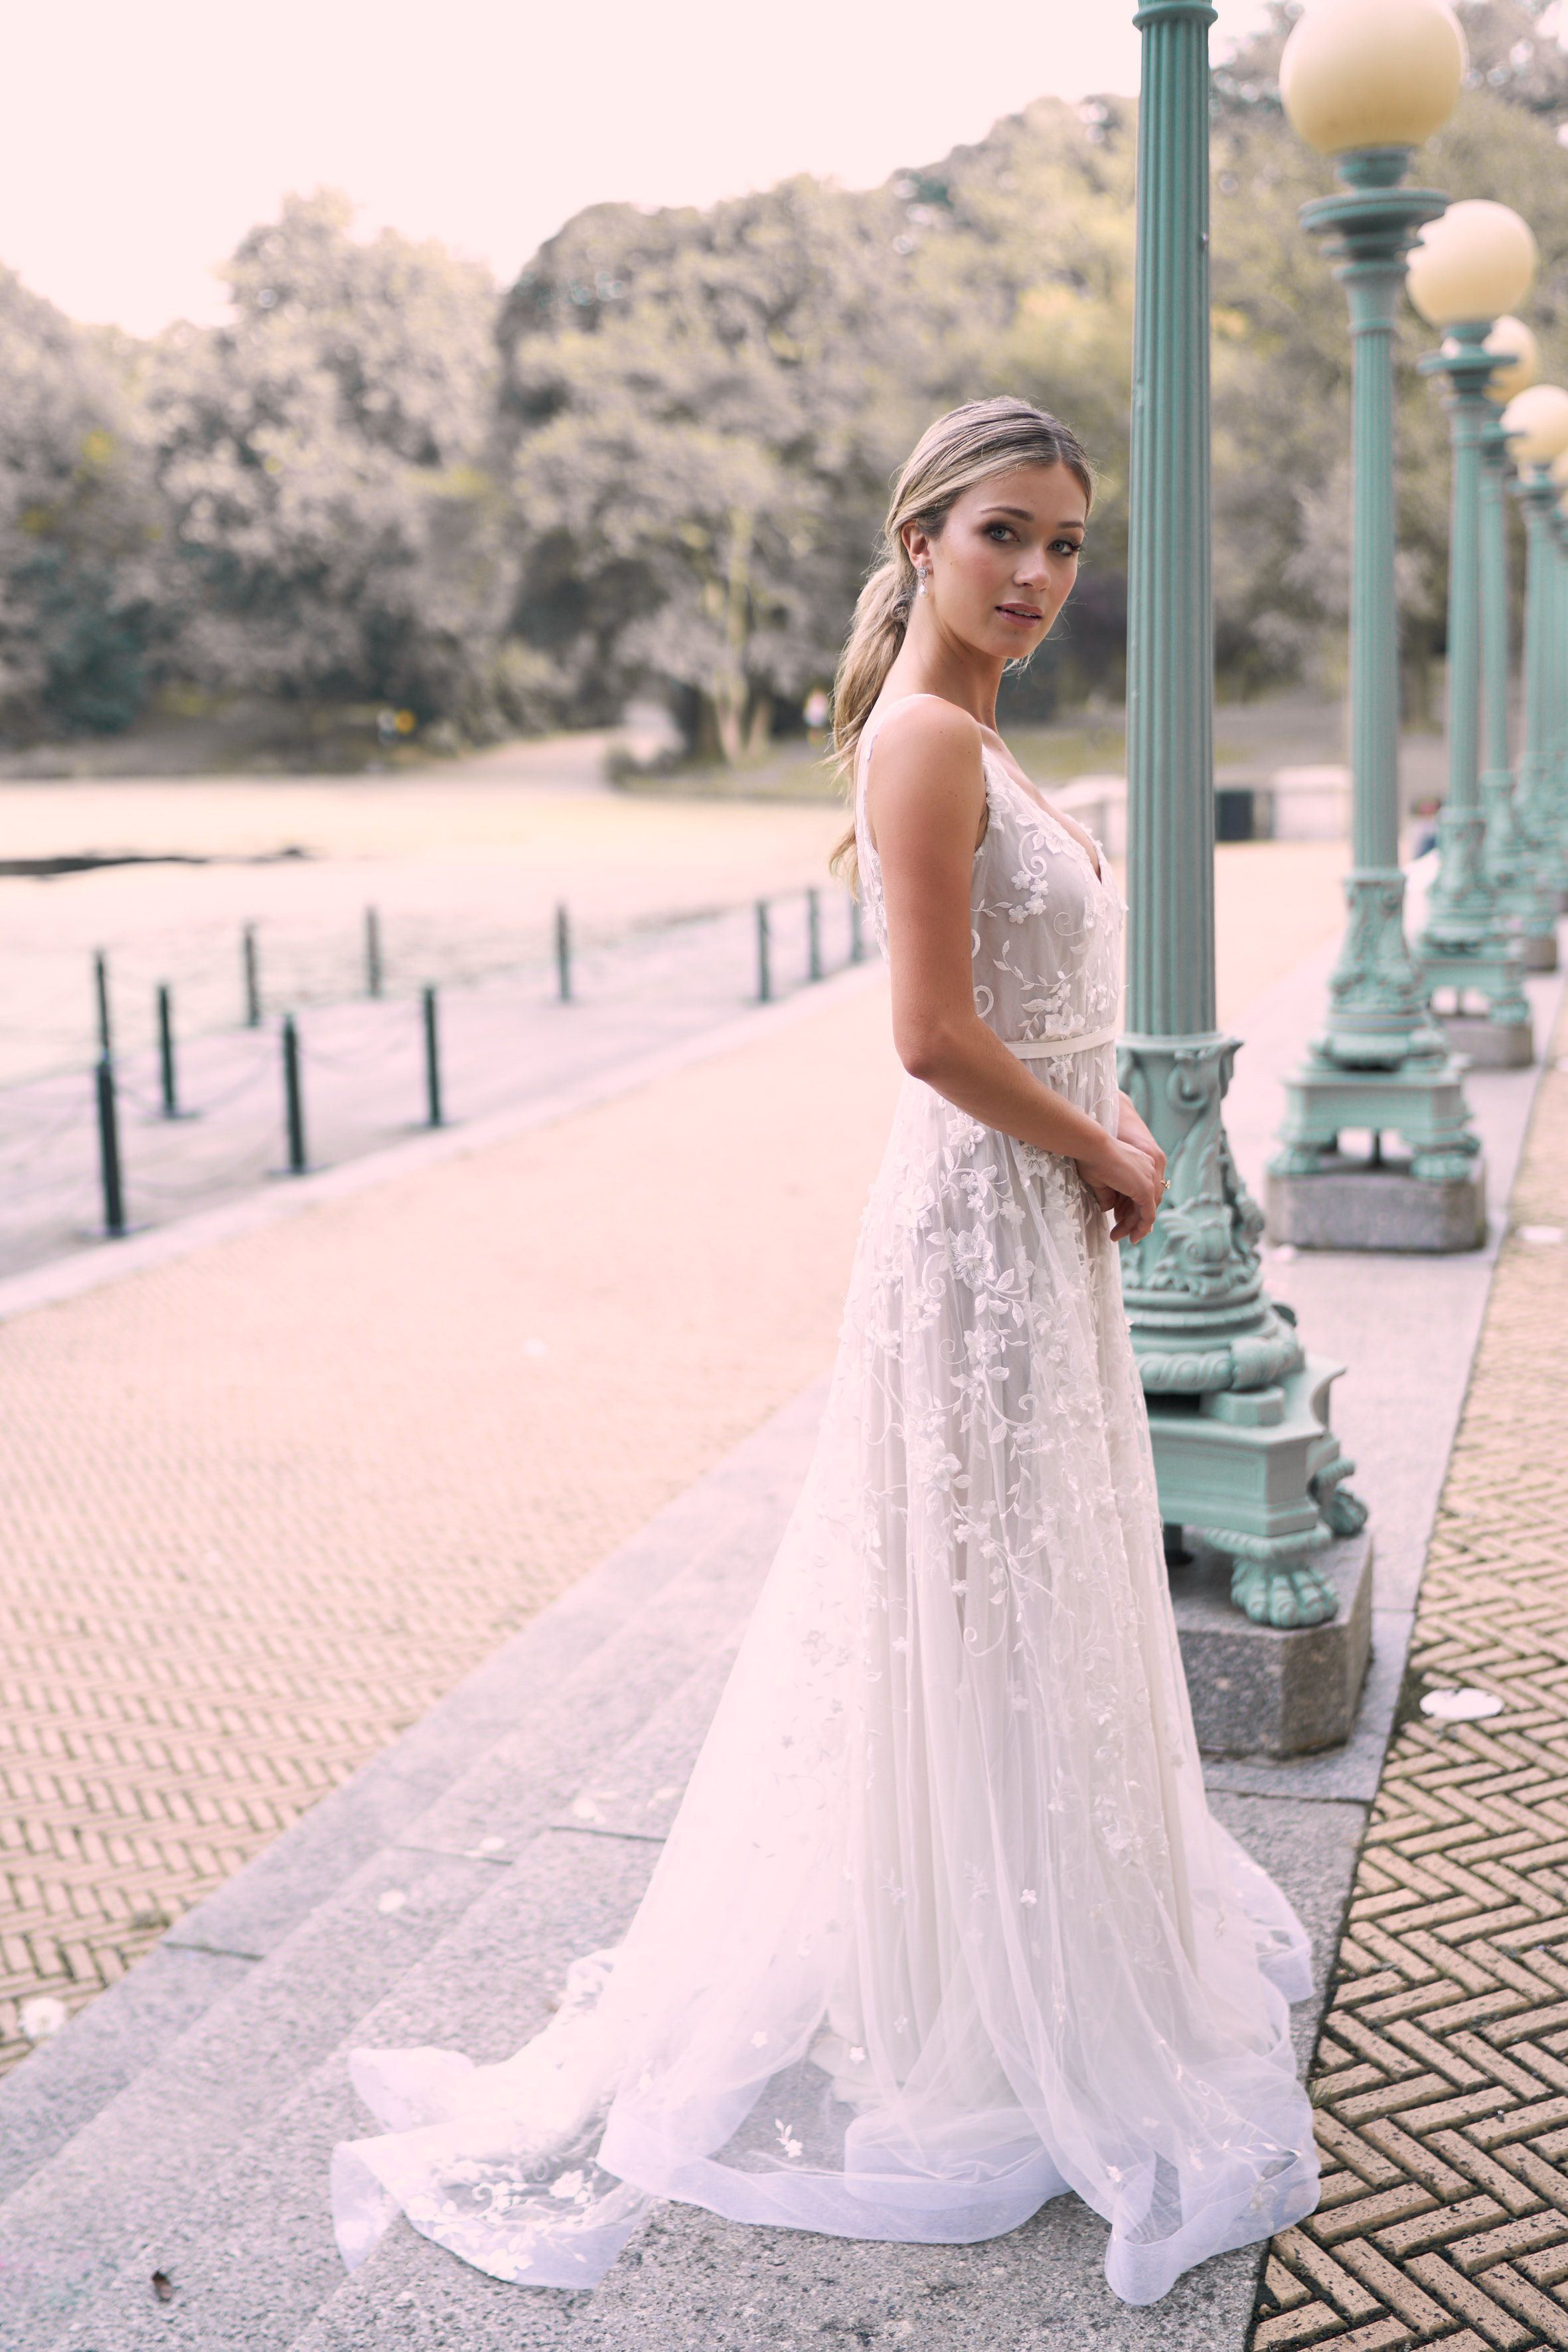 Anna Campbell Amelie Dress Bridal Gowns Vintage Wedding Dresses Pinterest Wedding Dresses